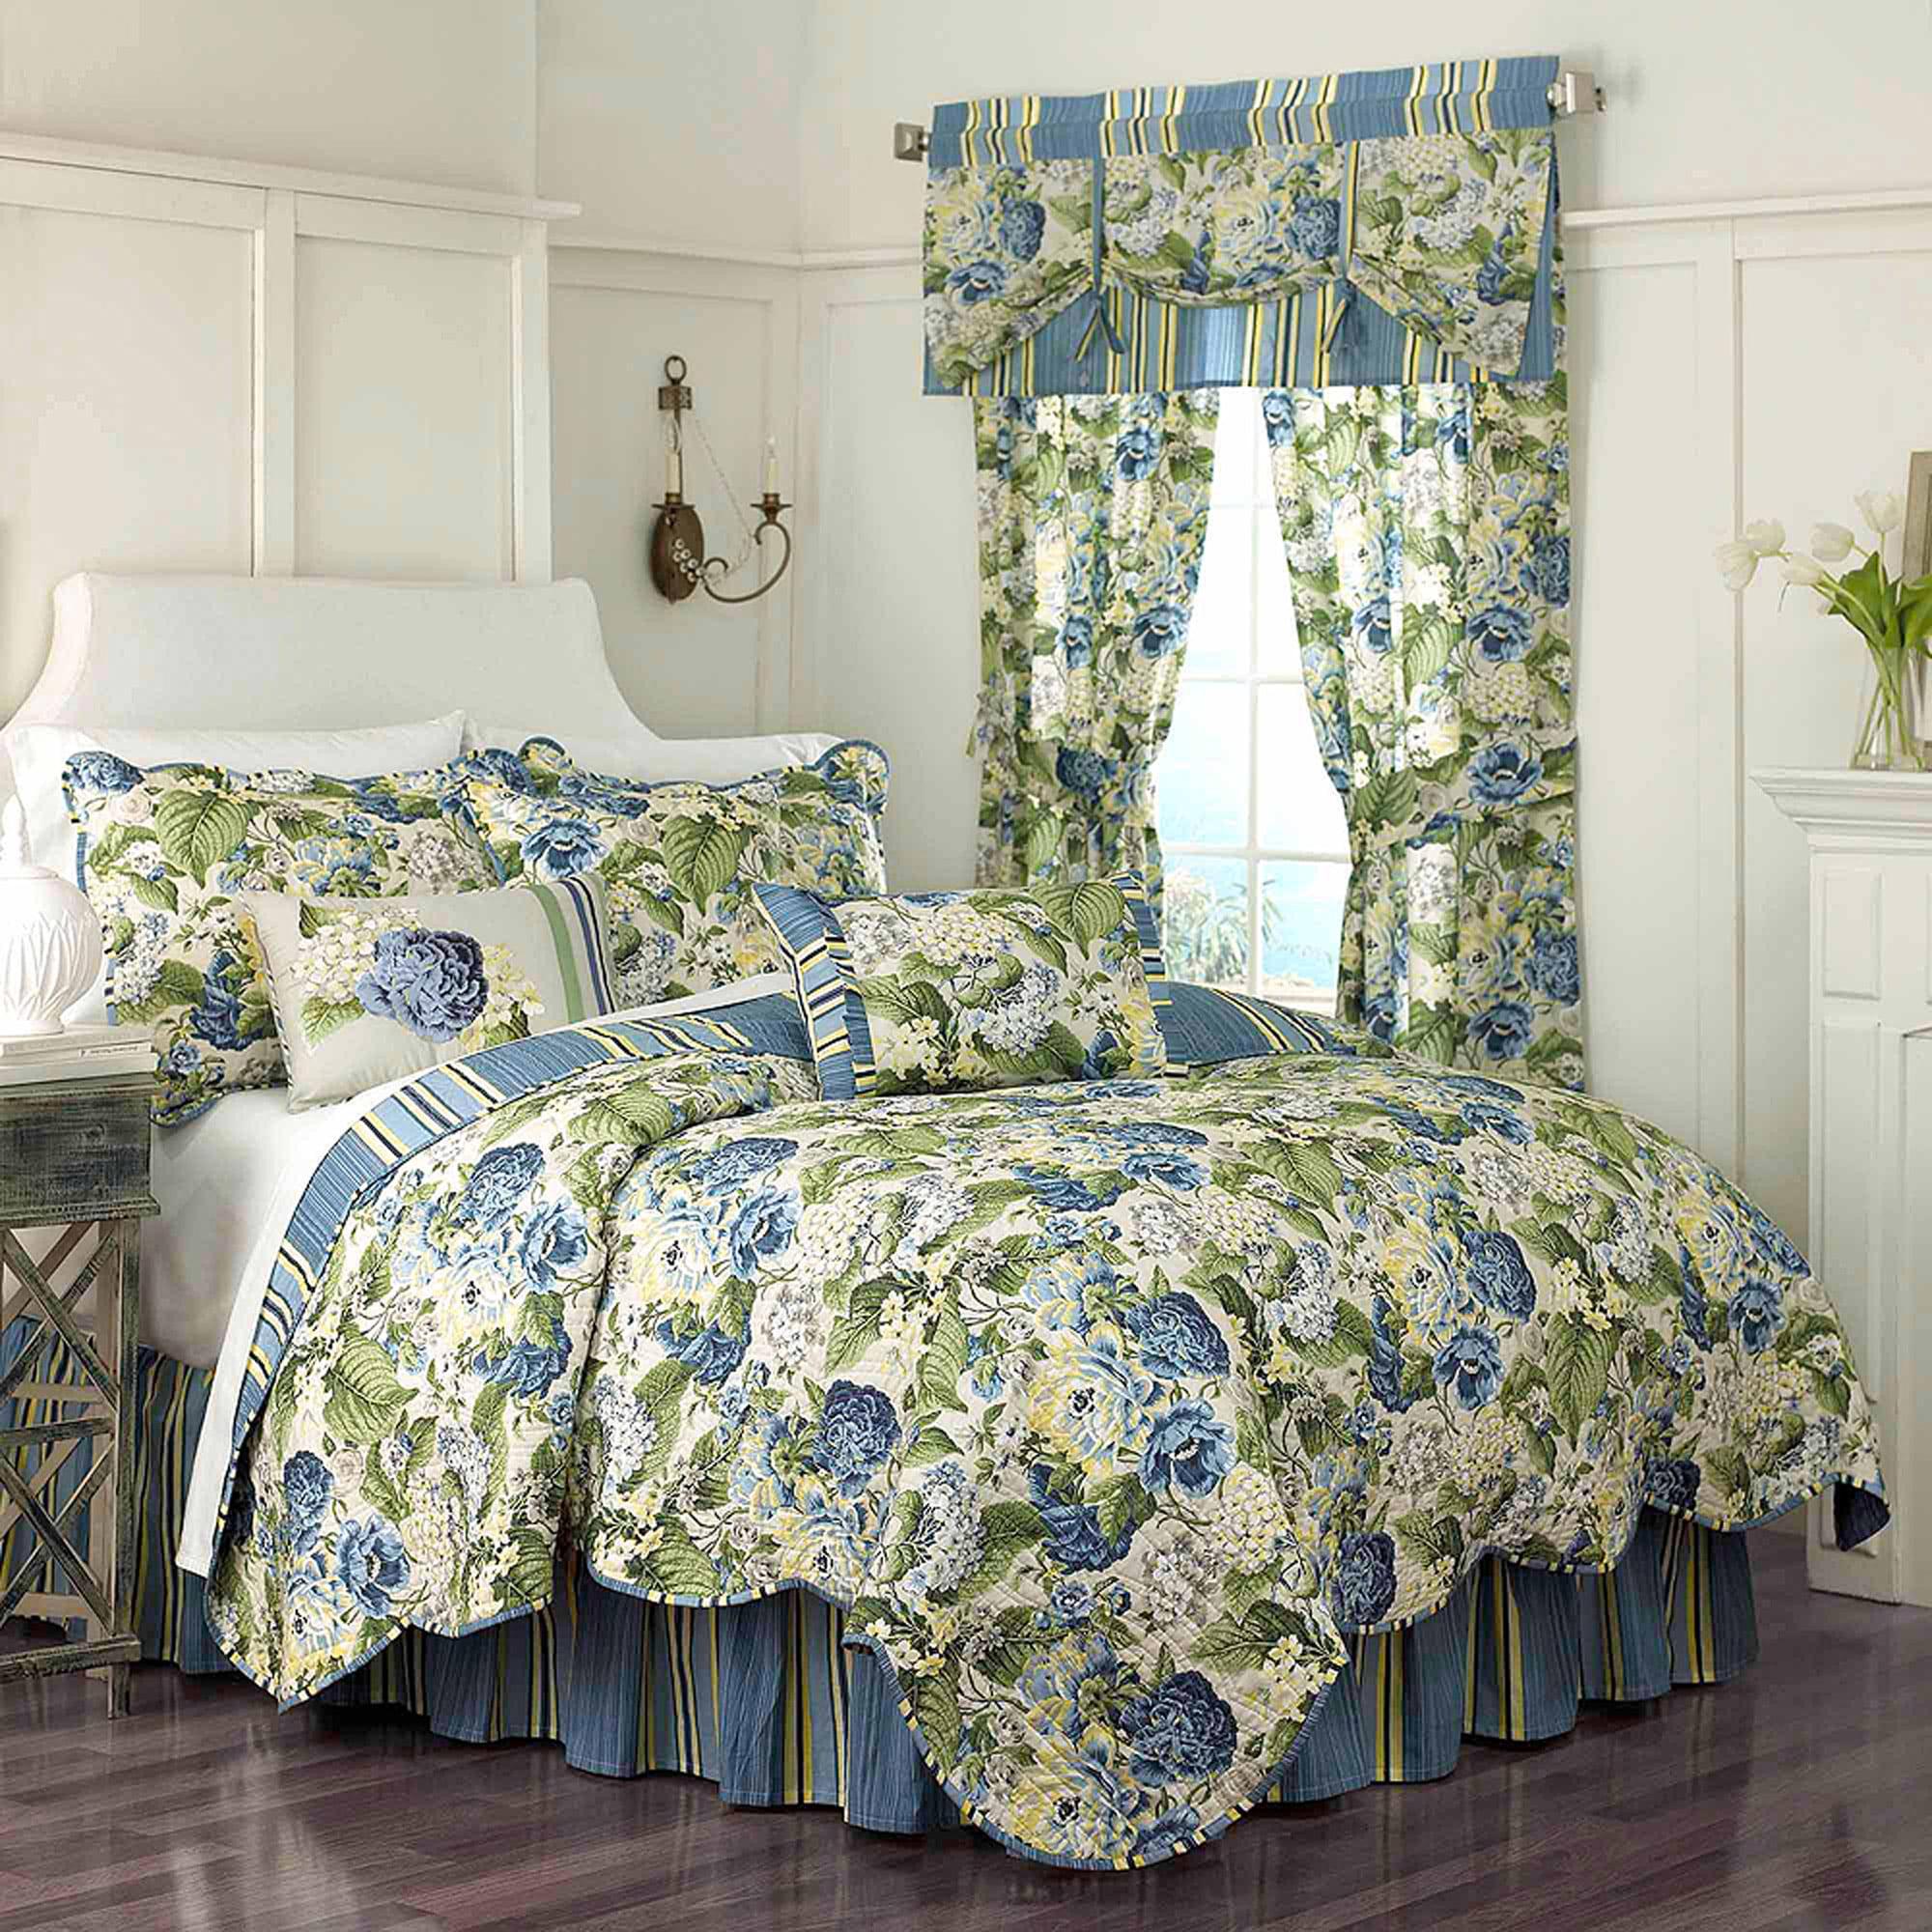 Floral Flourish Bedding Quilt Set